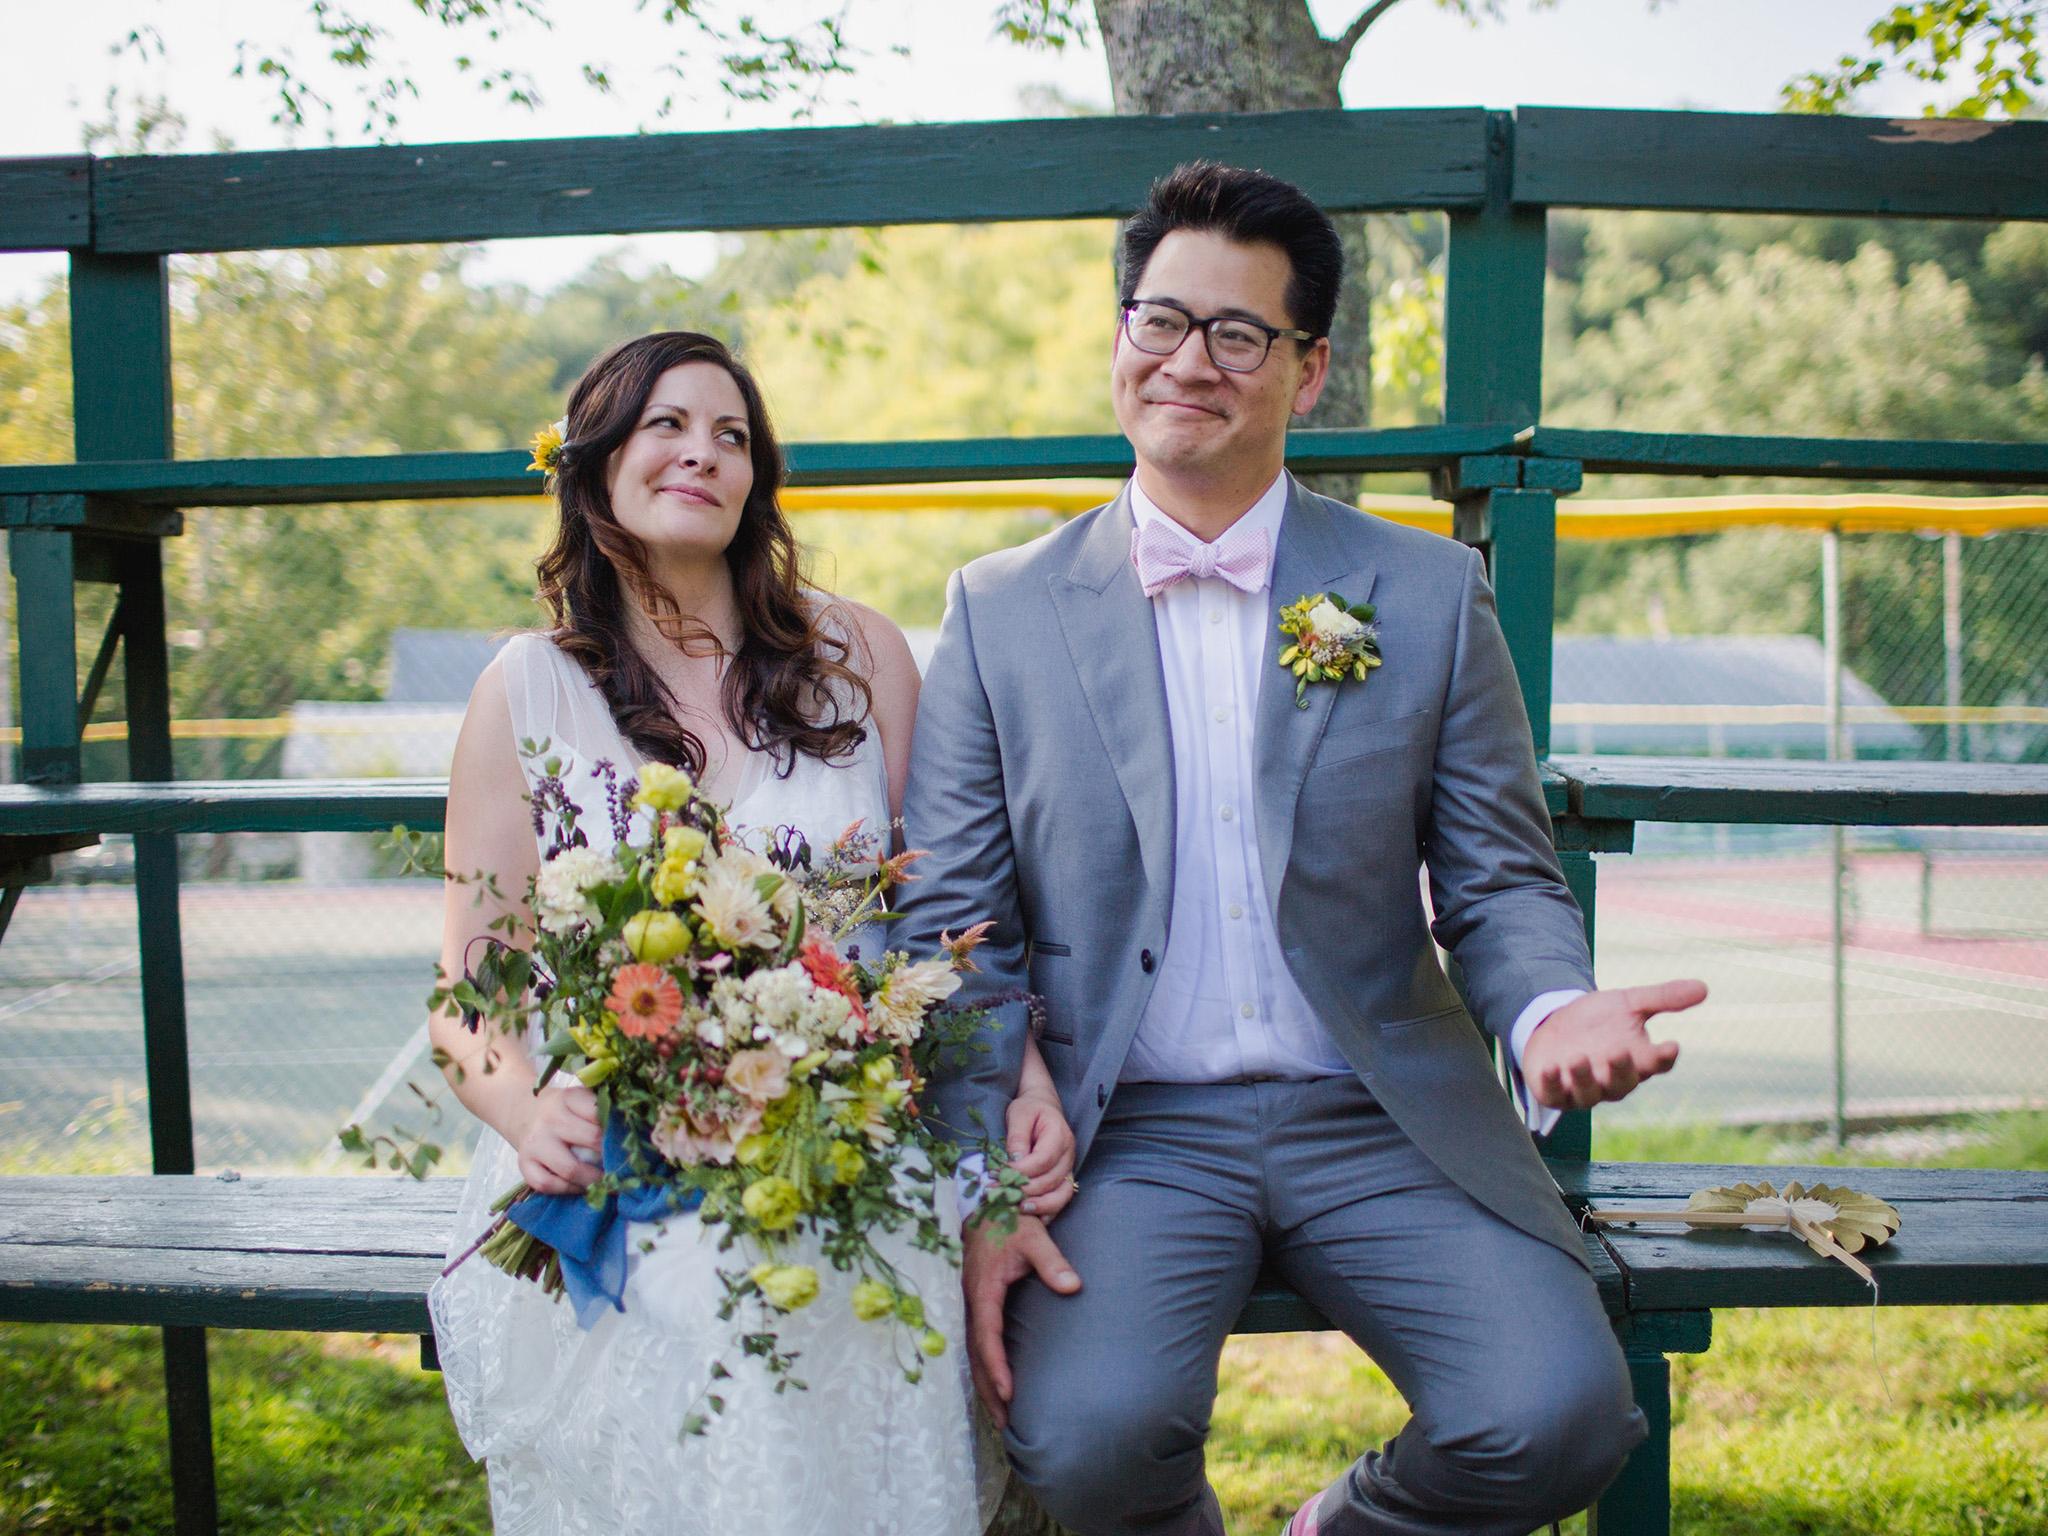 Heart-And-Dash-Camp-Wedding-Planner.jpg